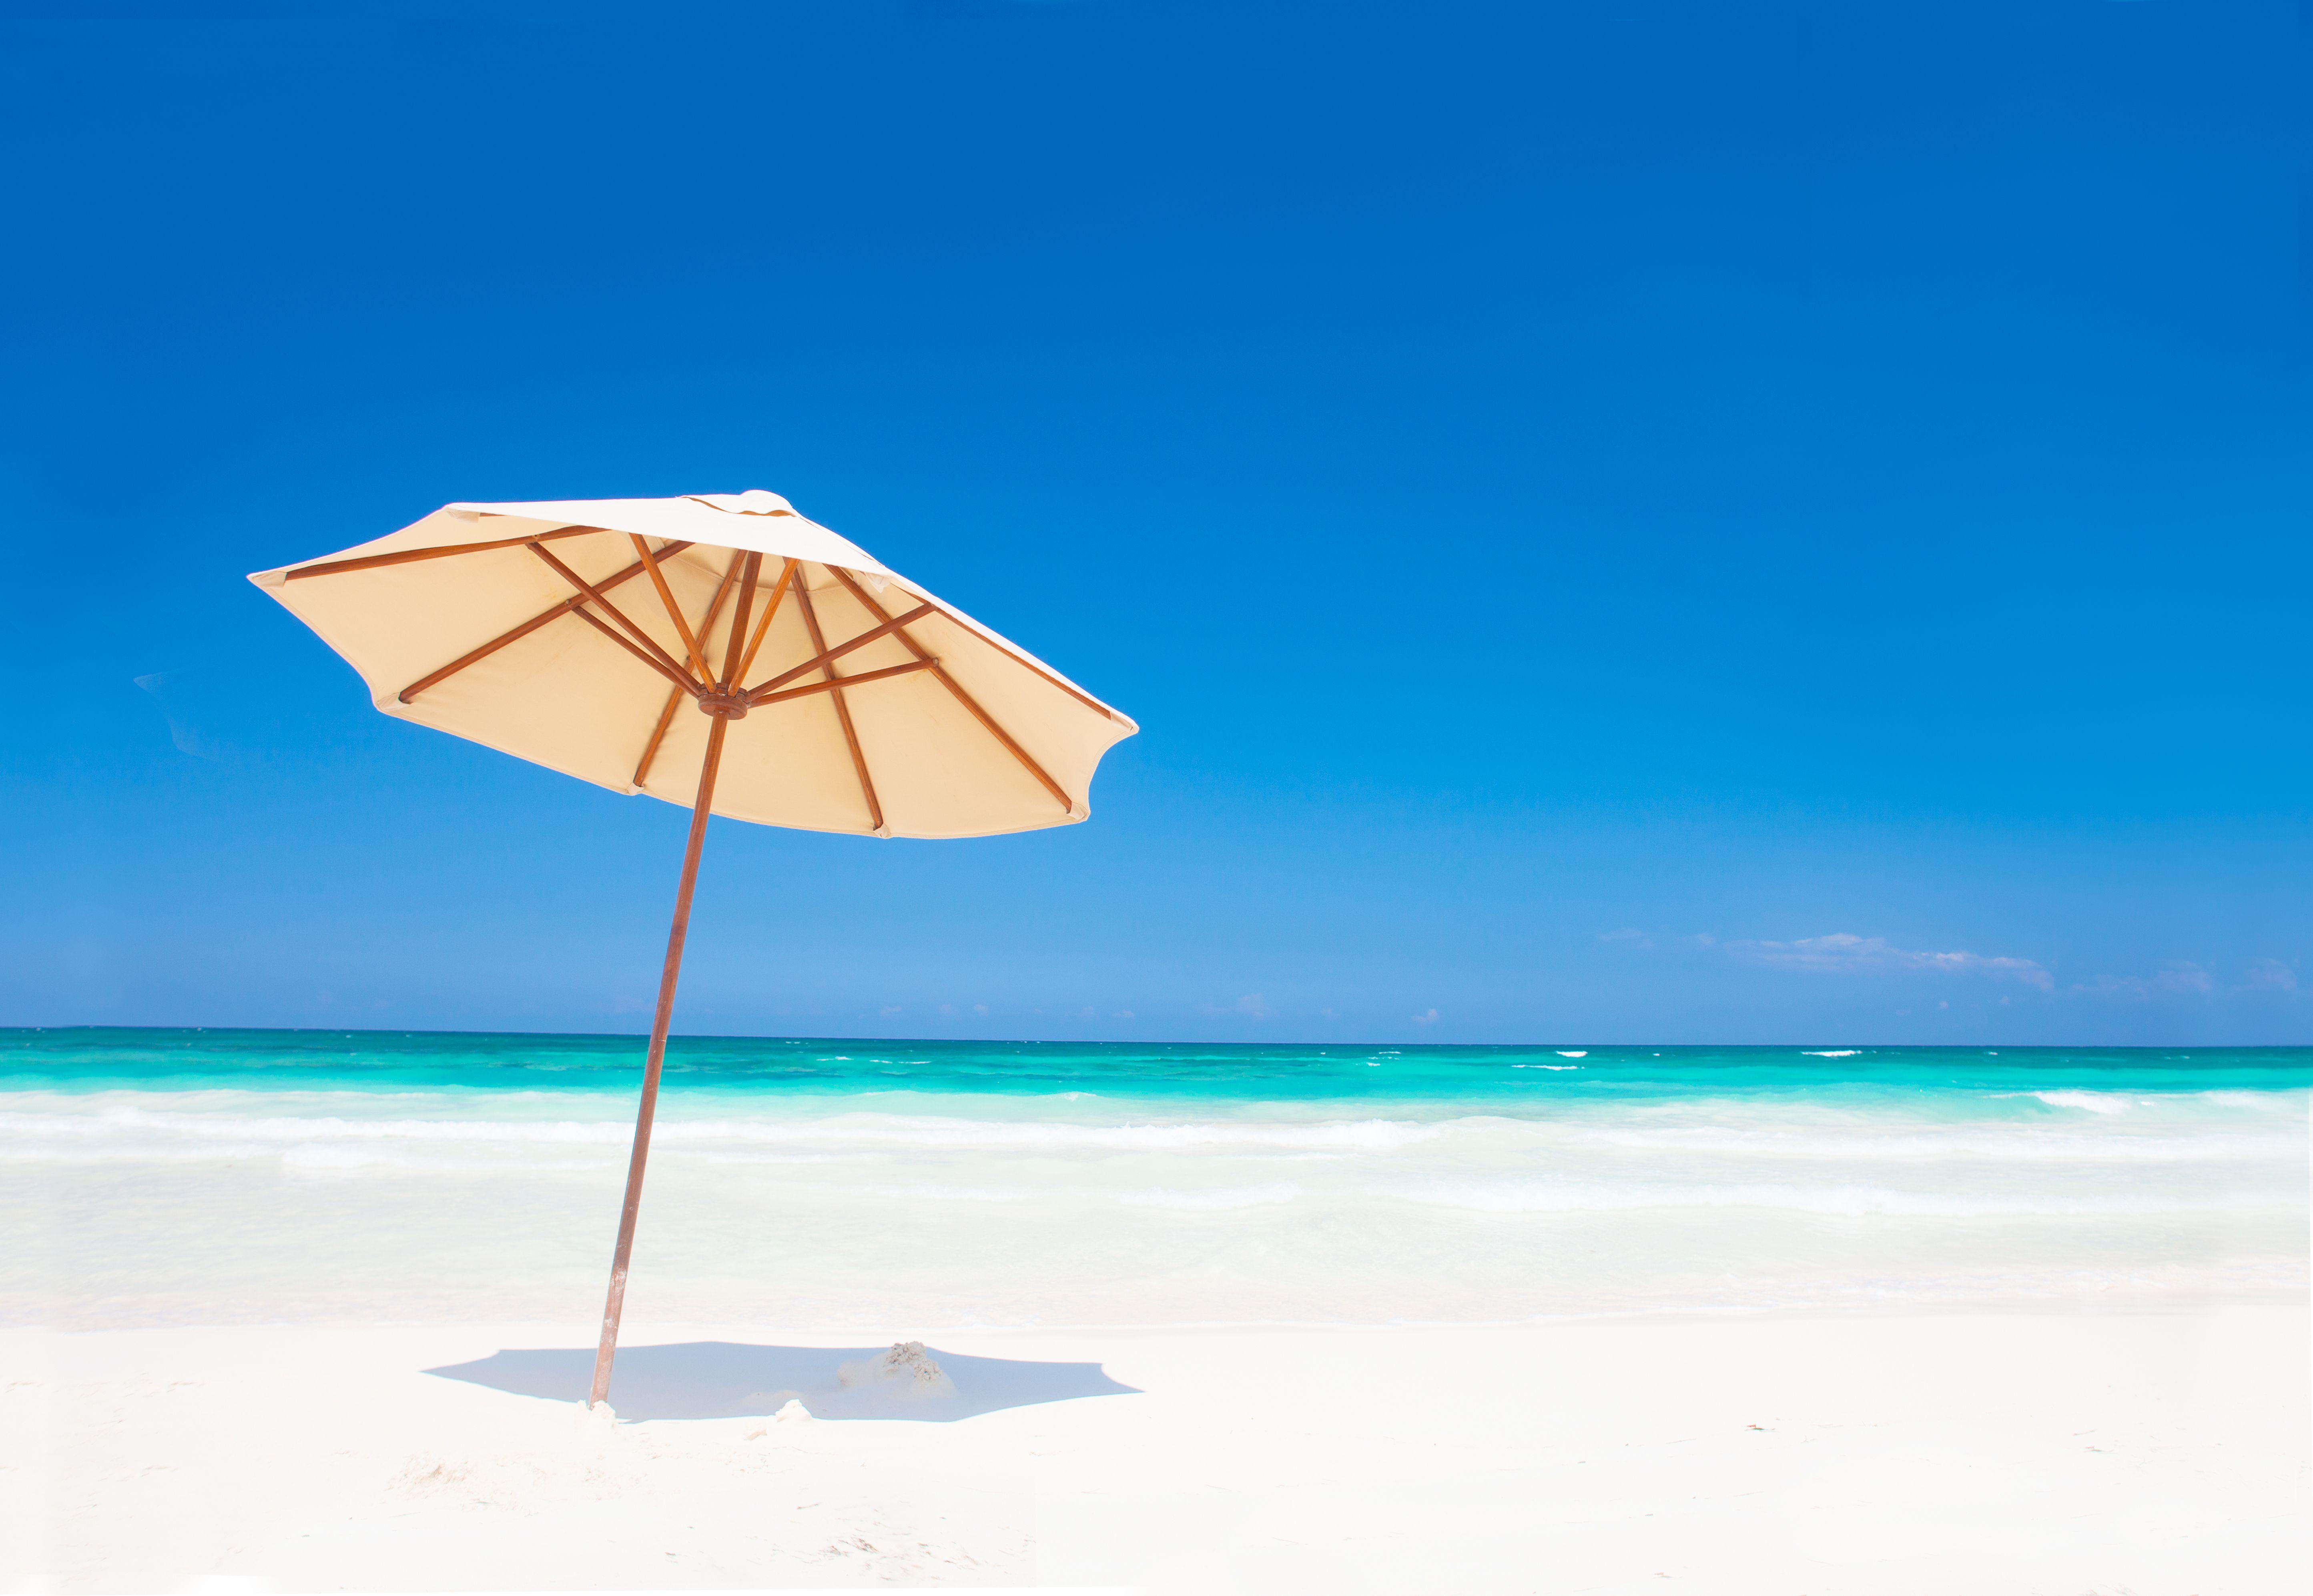 Beach Umbrella Barbados Property List The Beach Pinterest